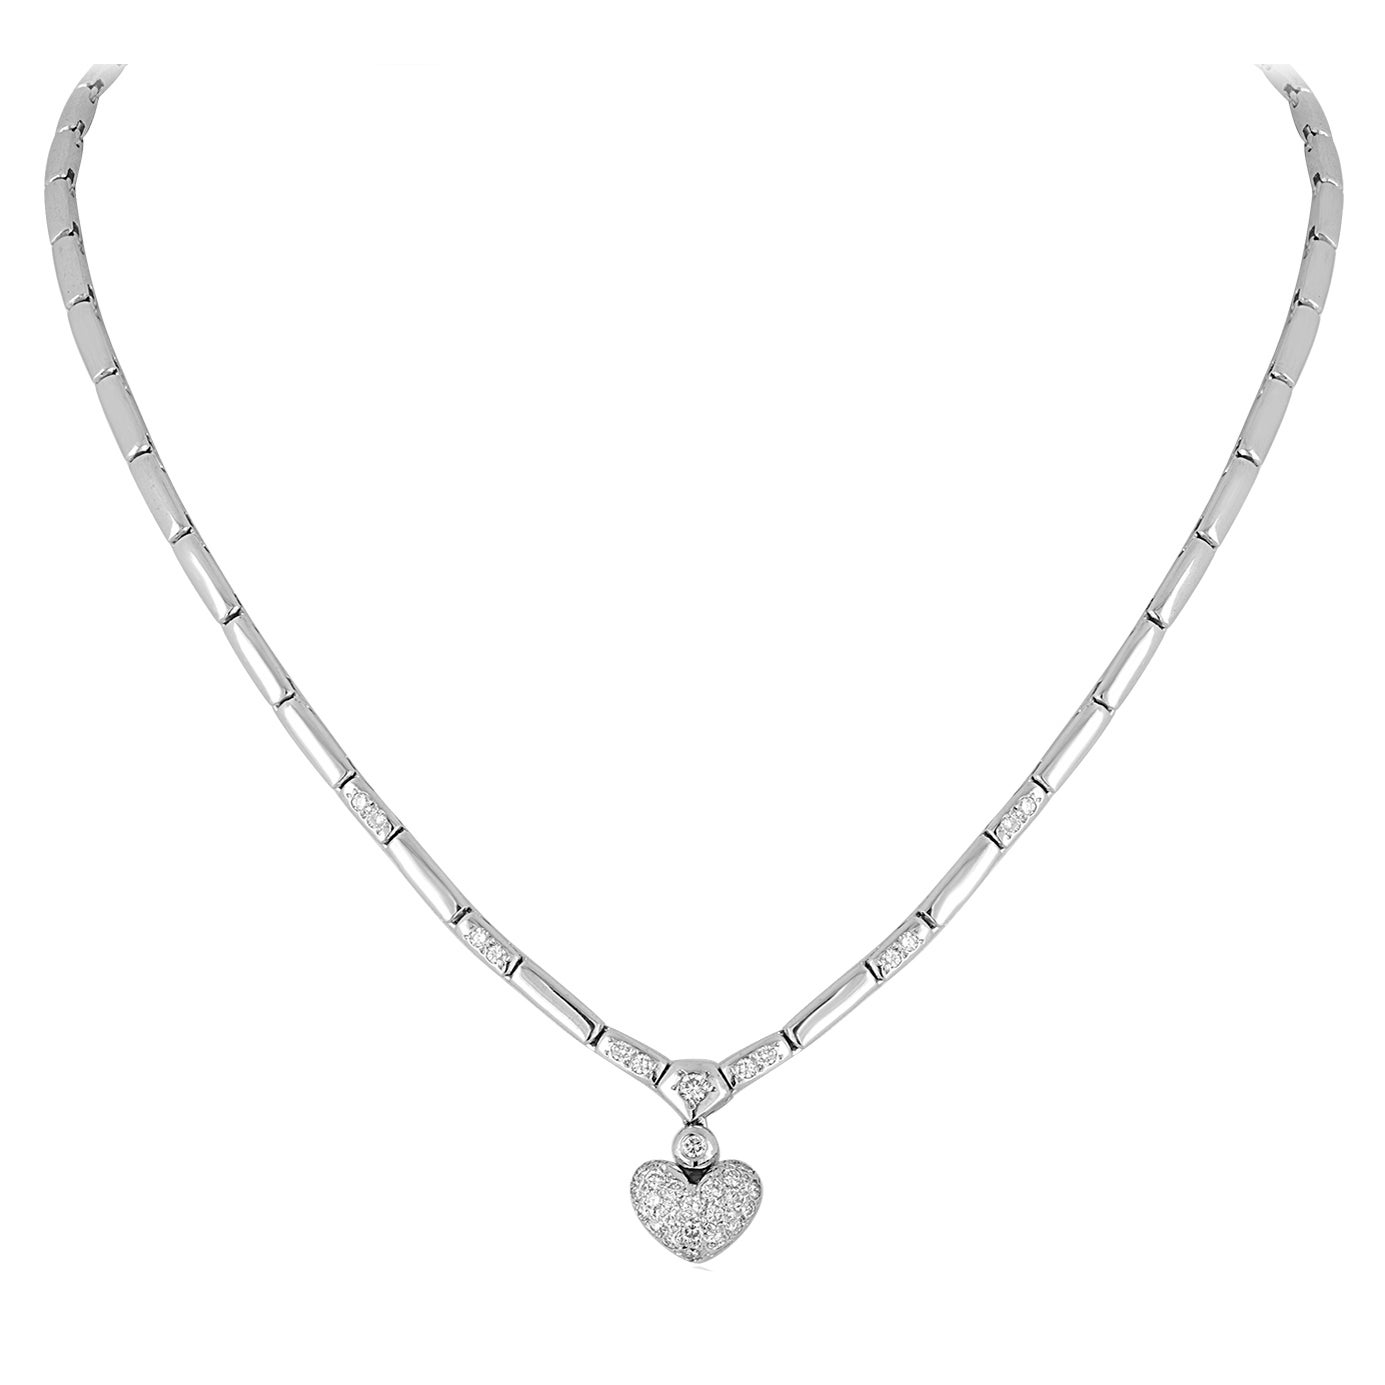 0.77 Carats Diamond Gold Heart Necklace